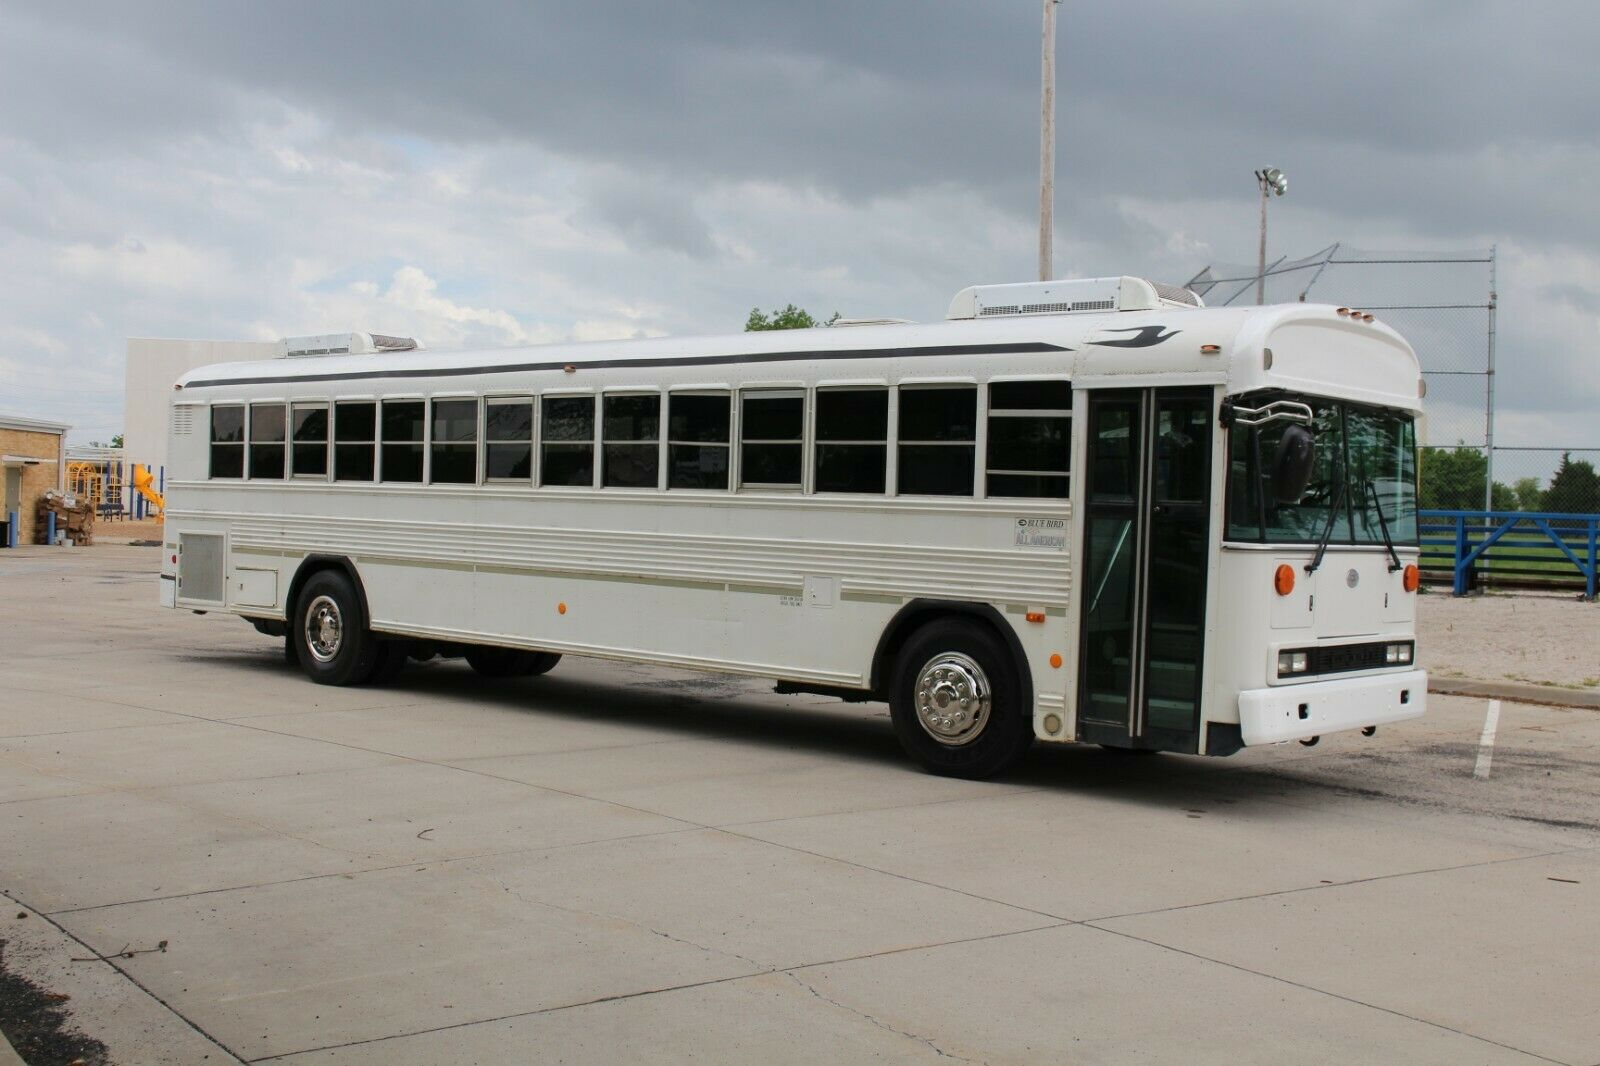 2009 Blue Bird School Activity Bus Skoolie RV motor home 8.3L Cummins Used Buses